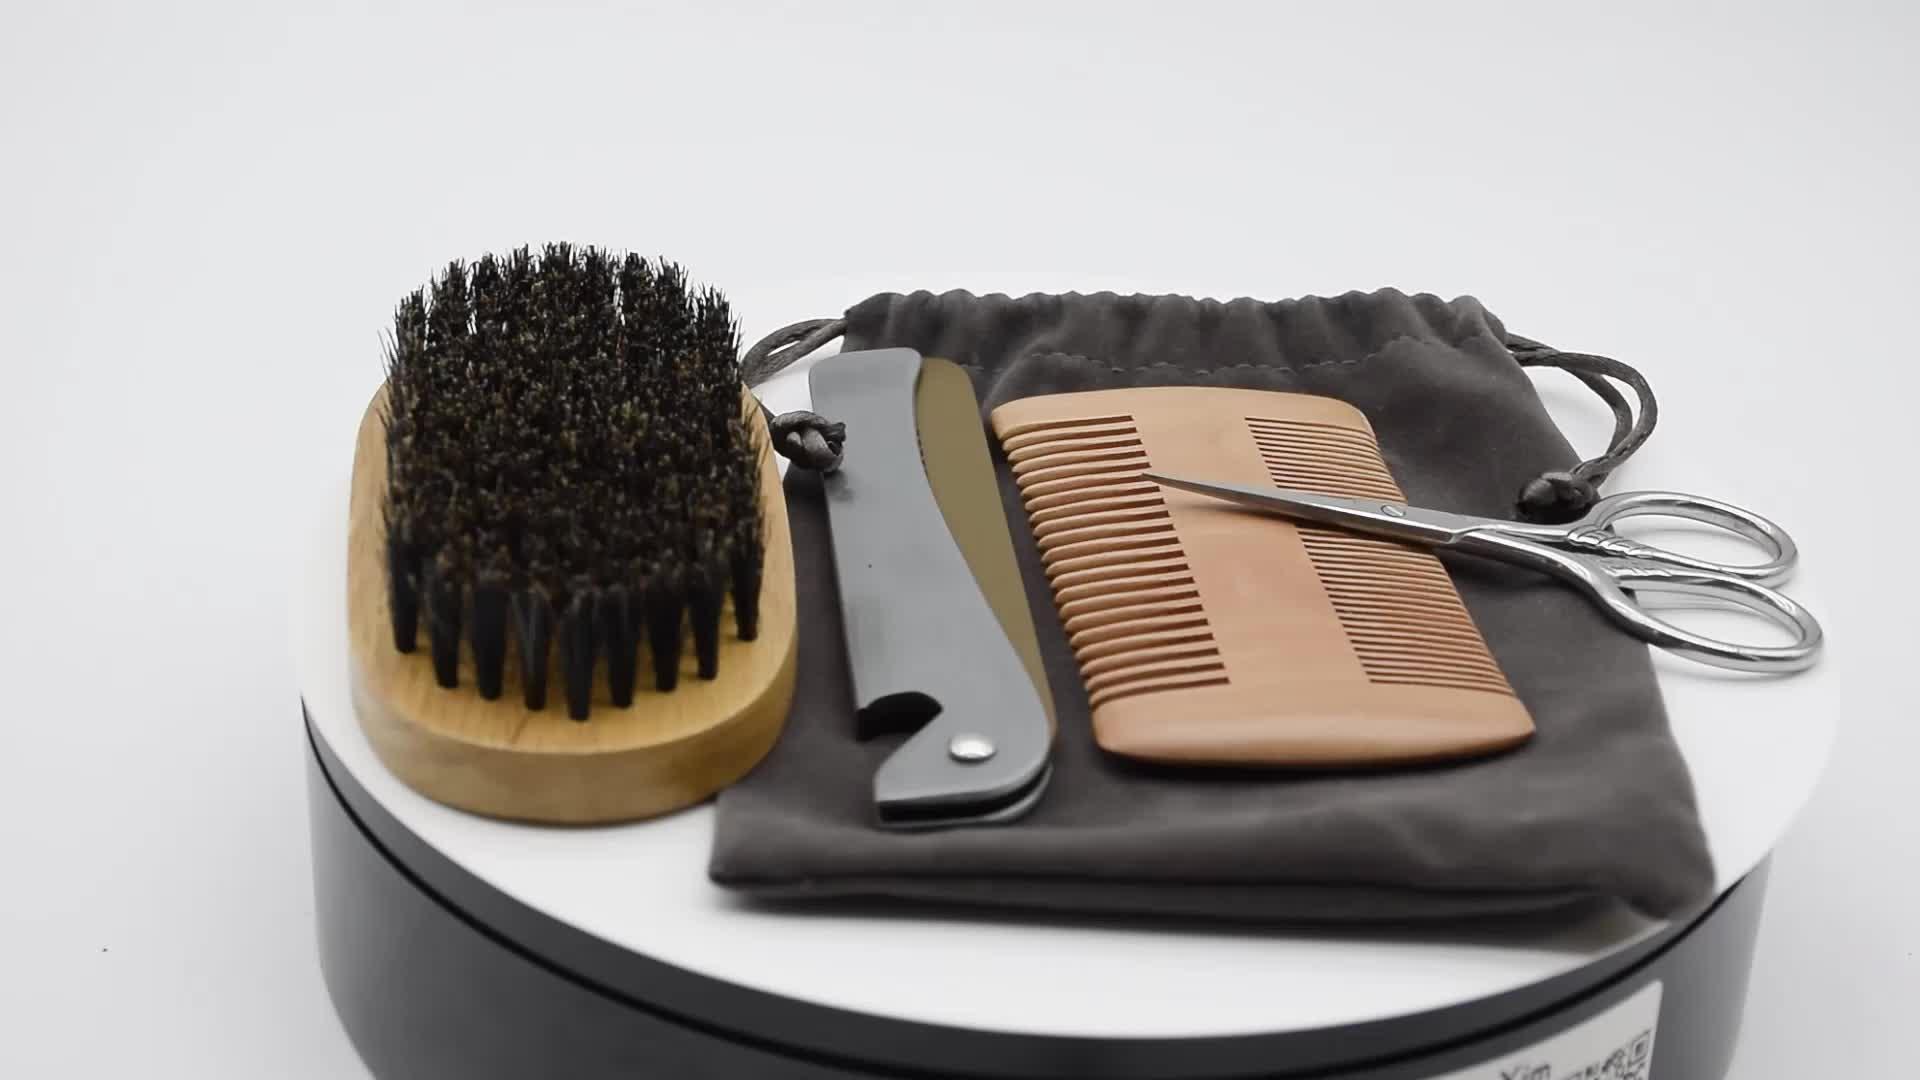 Wholesale 4pcs Wooden Foldable Beard Comb And Brush Set